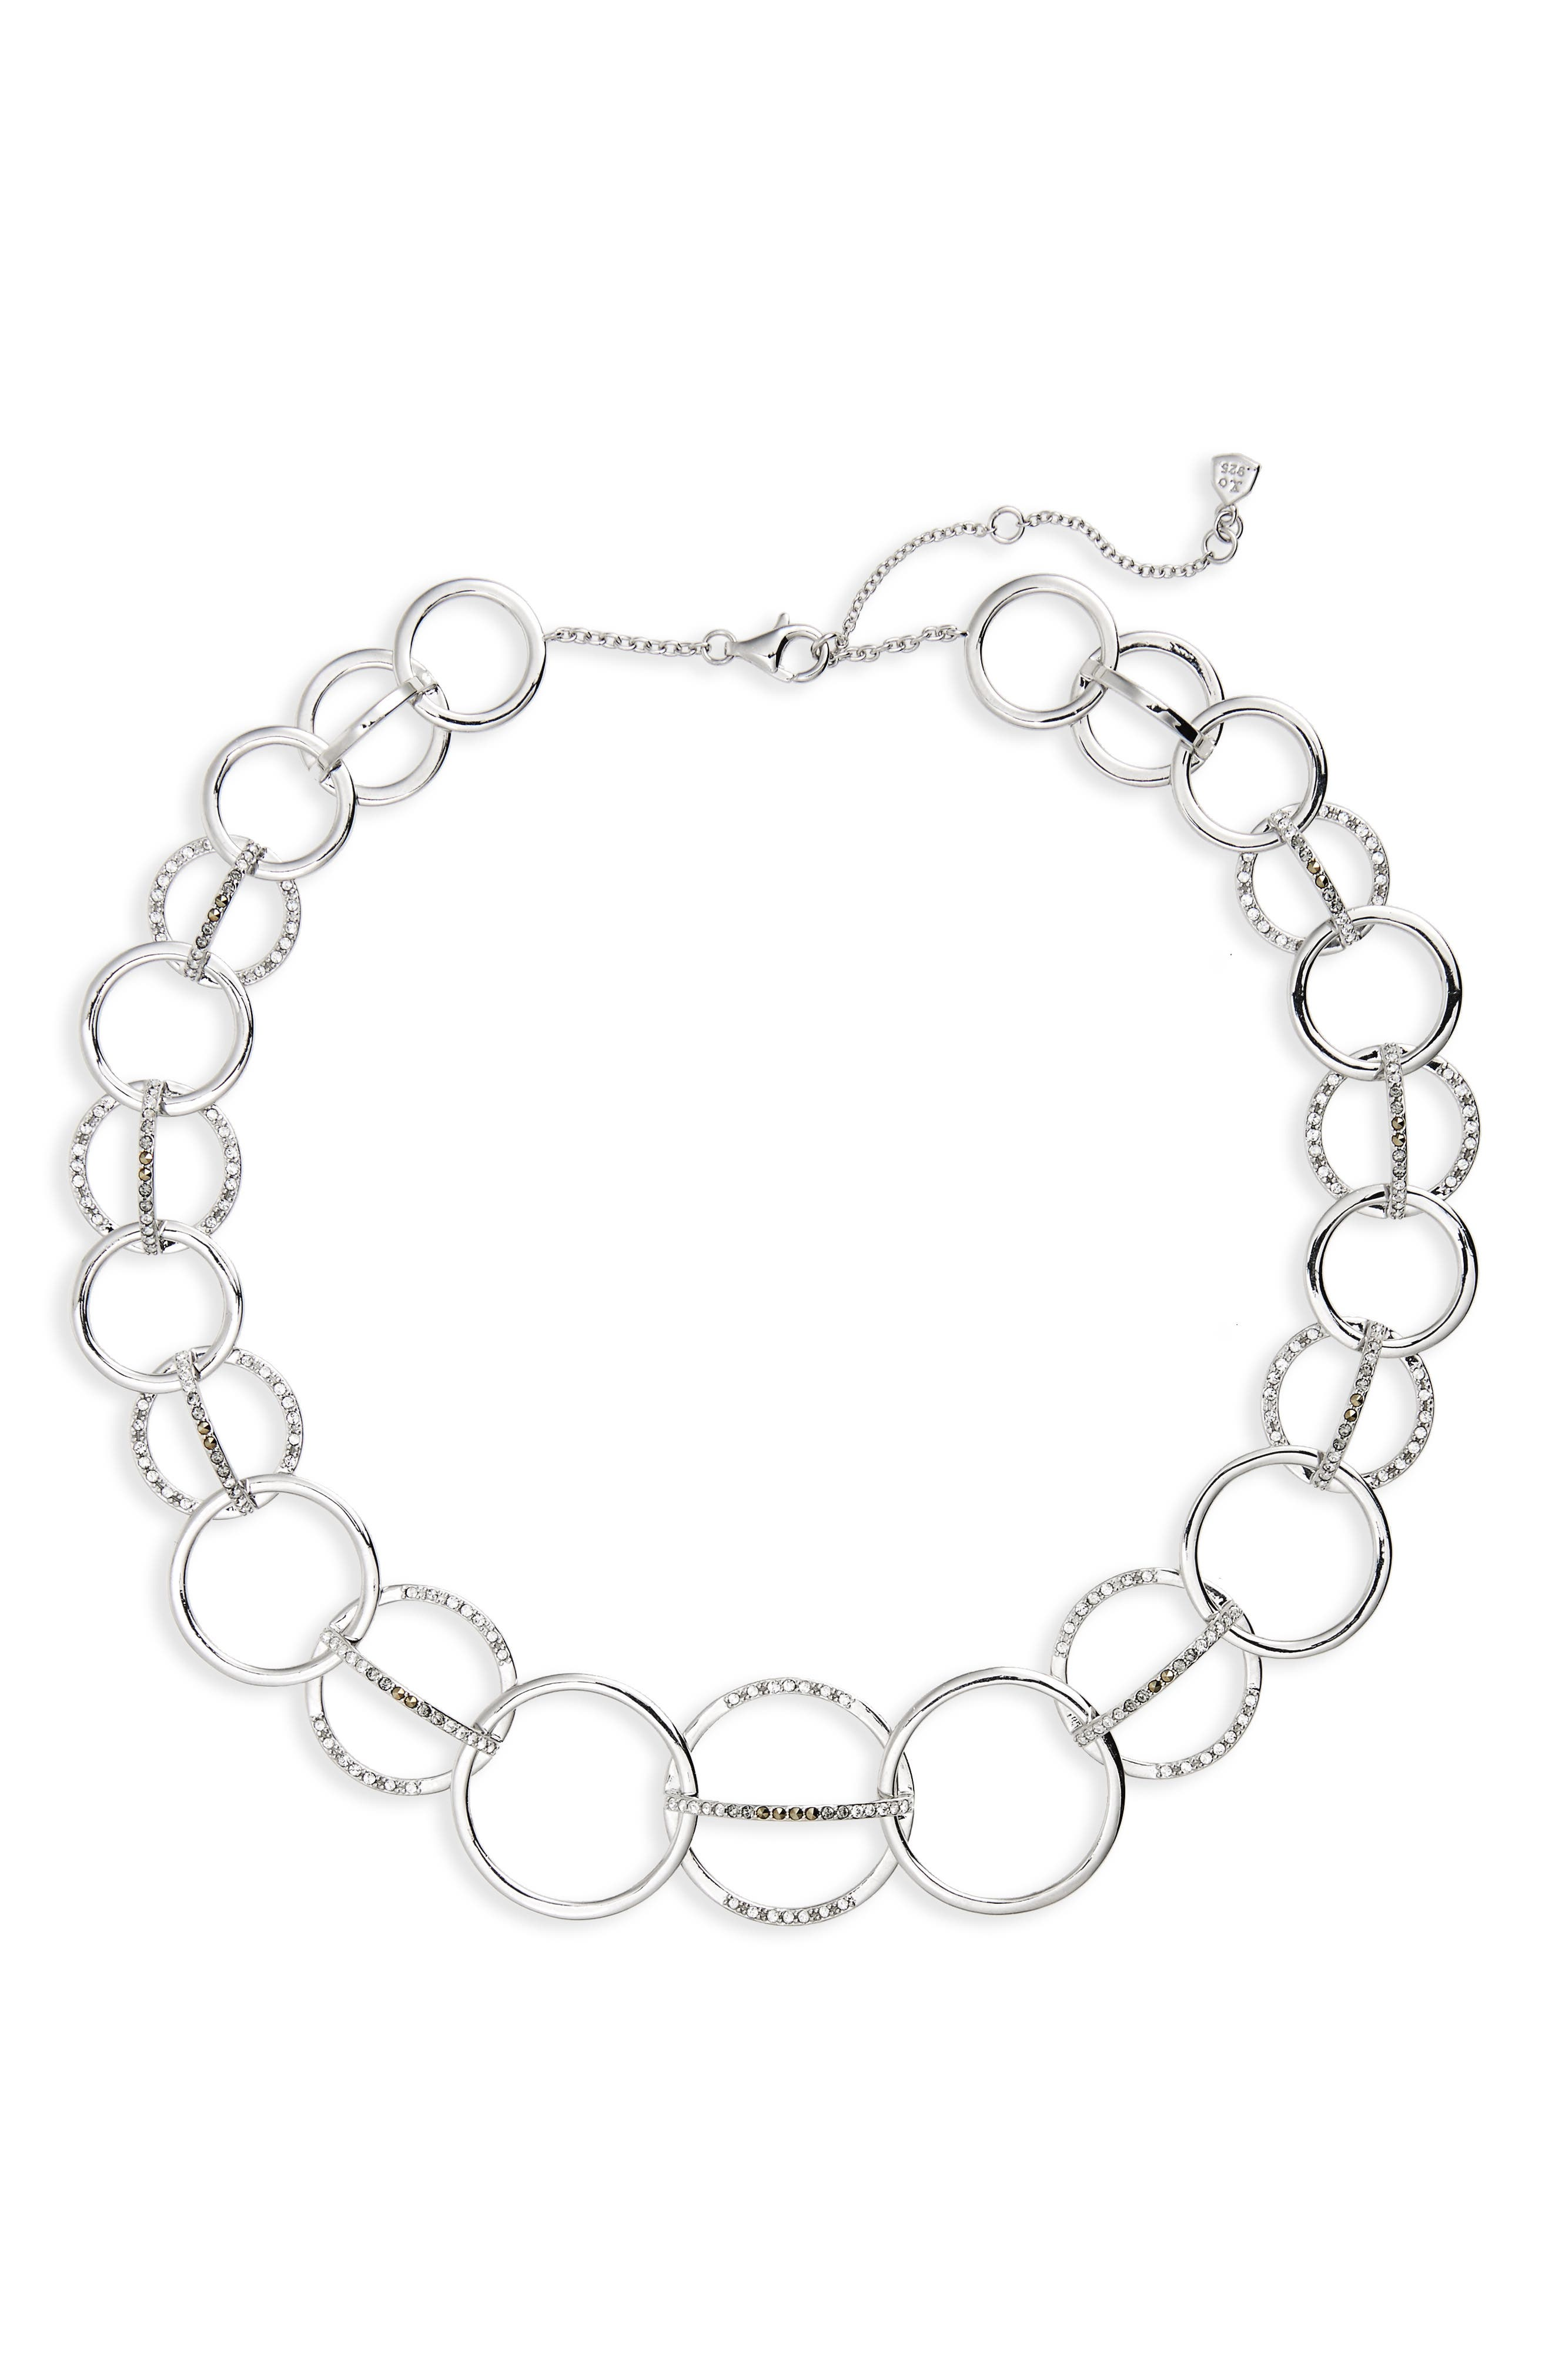 Main Image - Judith Jack Silver Sparkle Collar Necklace